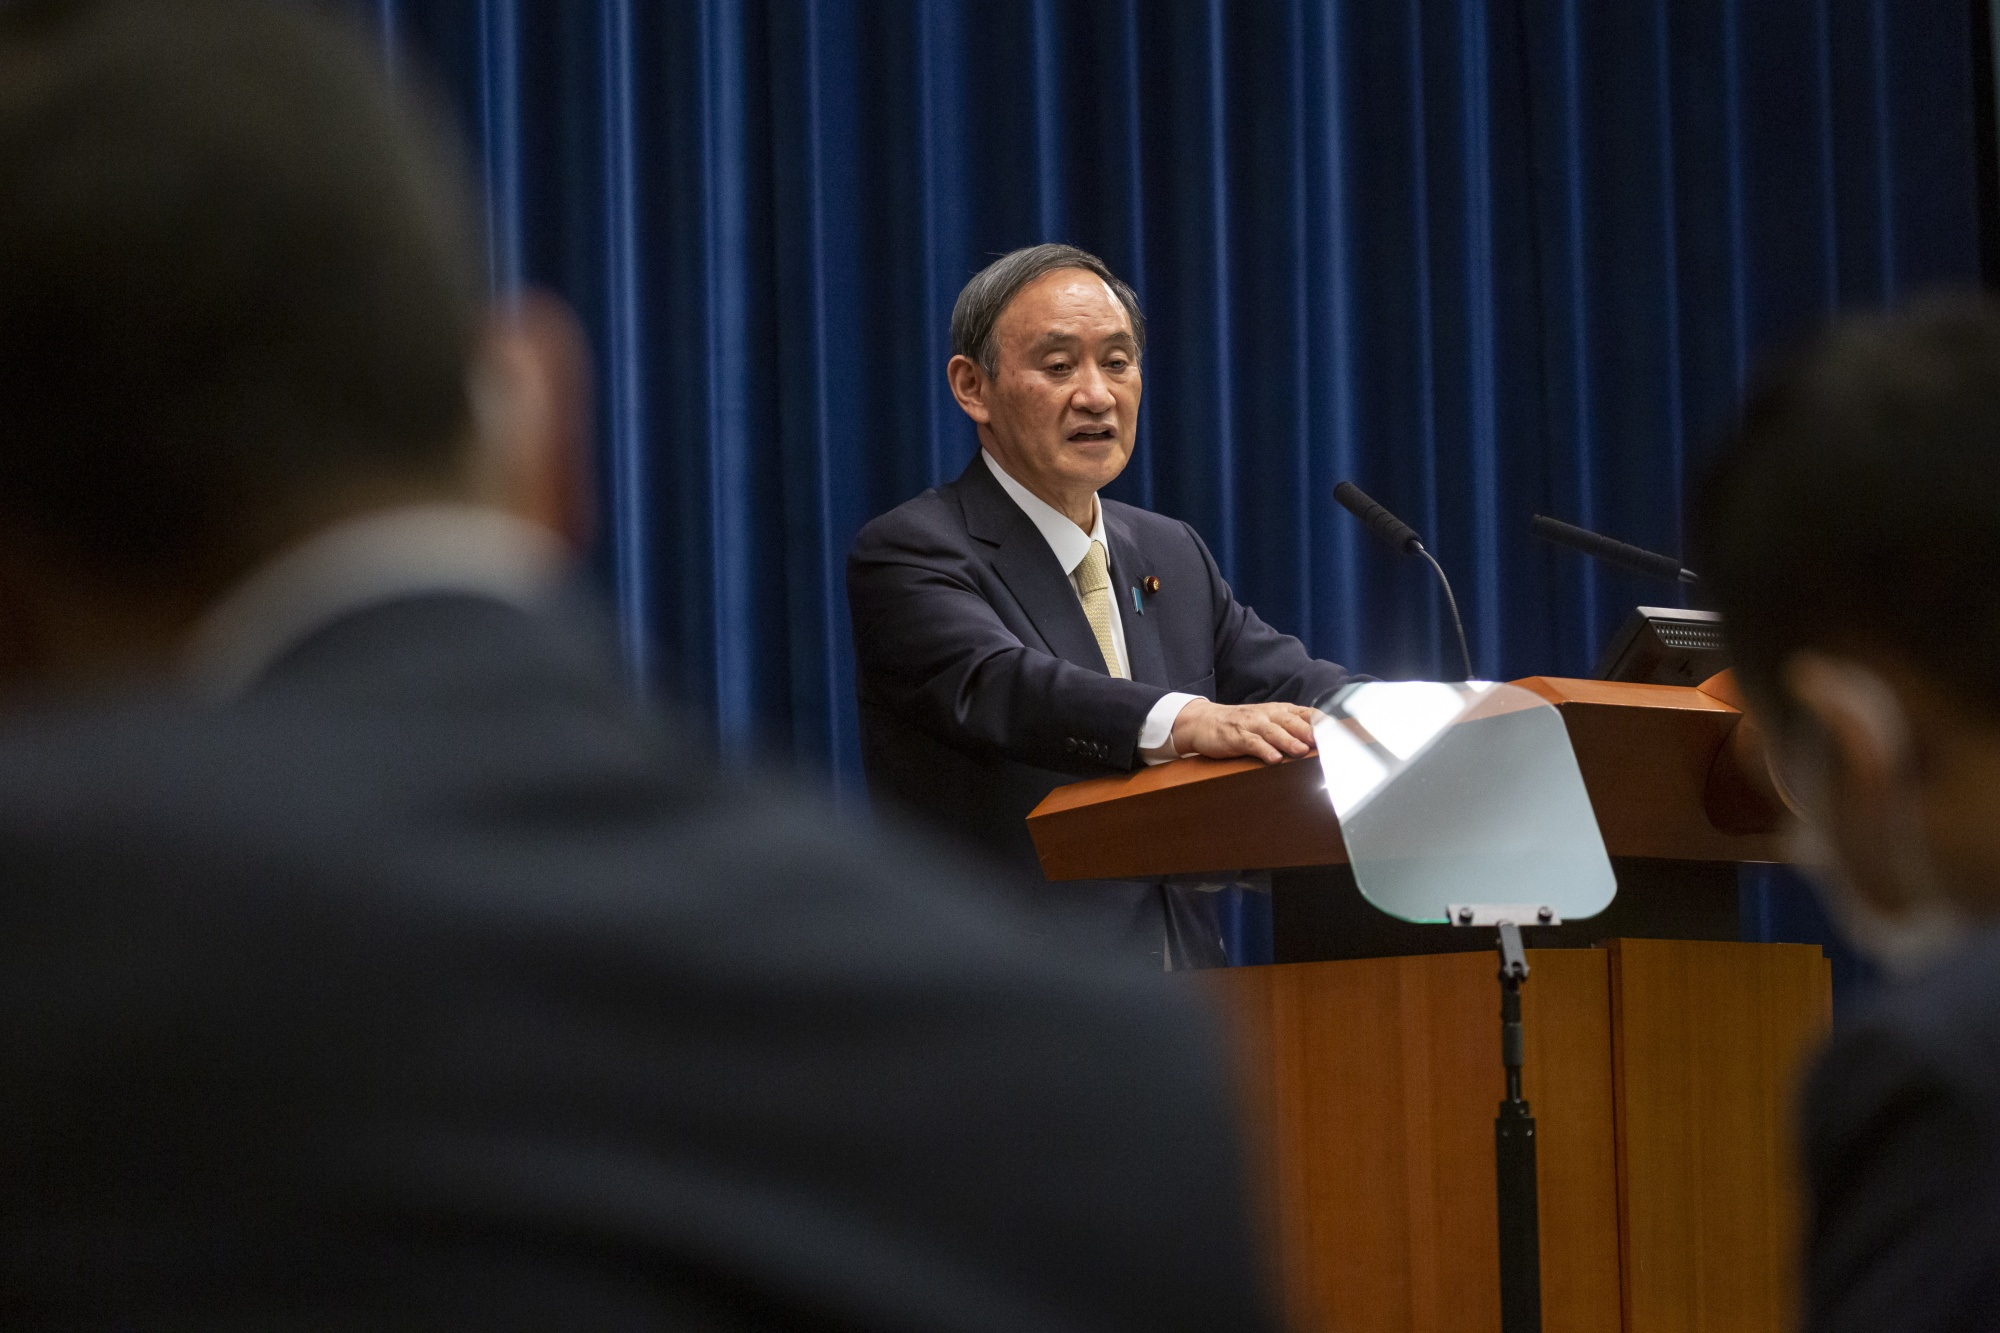 日本の菅義偉首相が非常事態を宣言